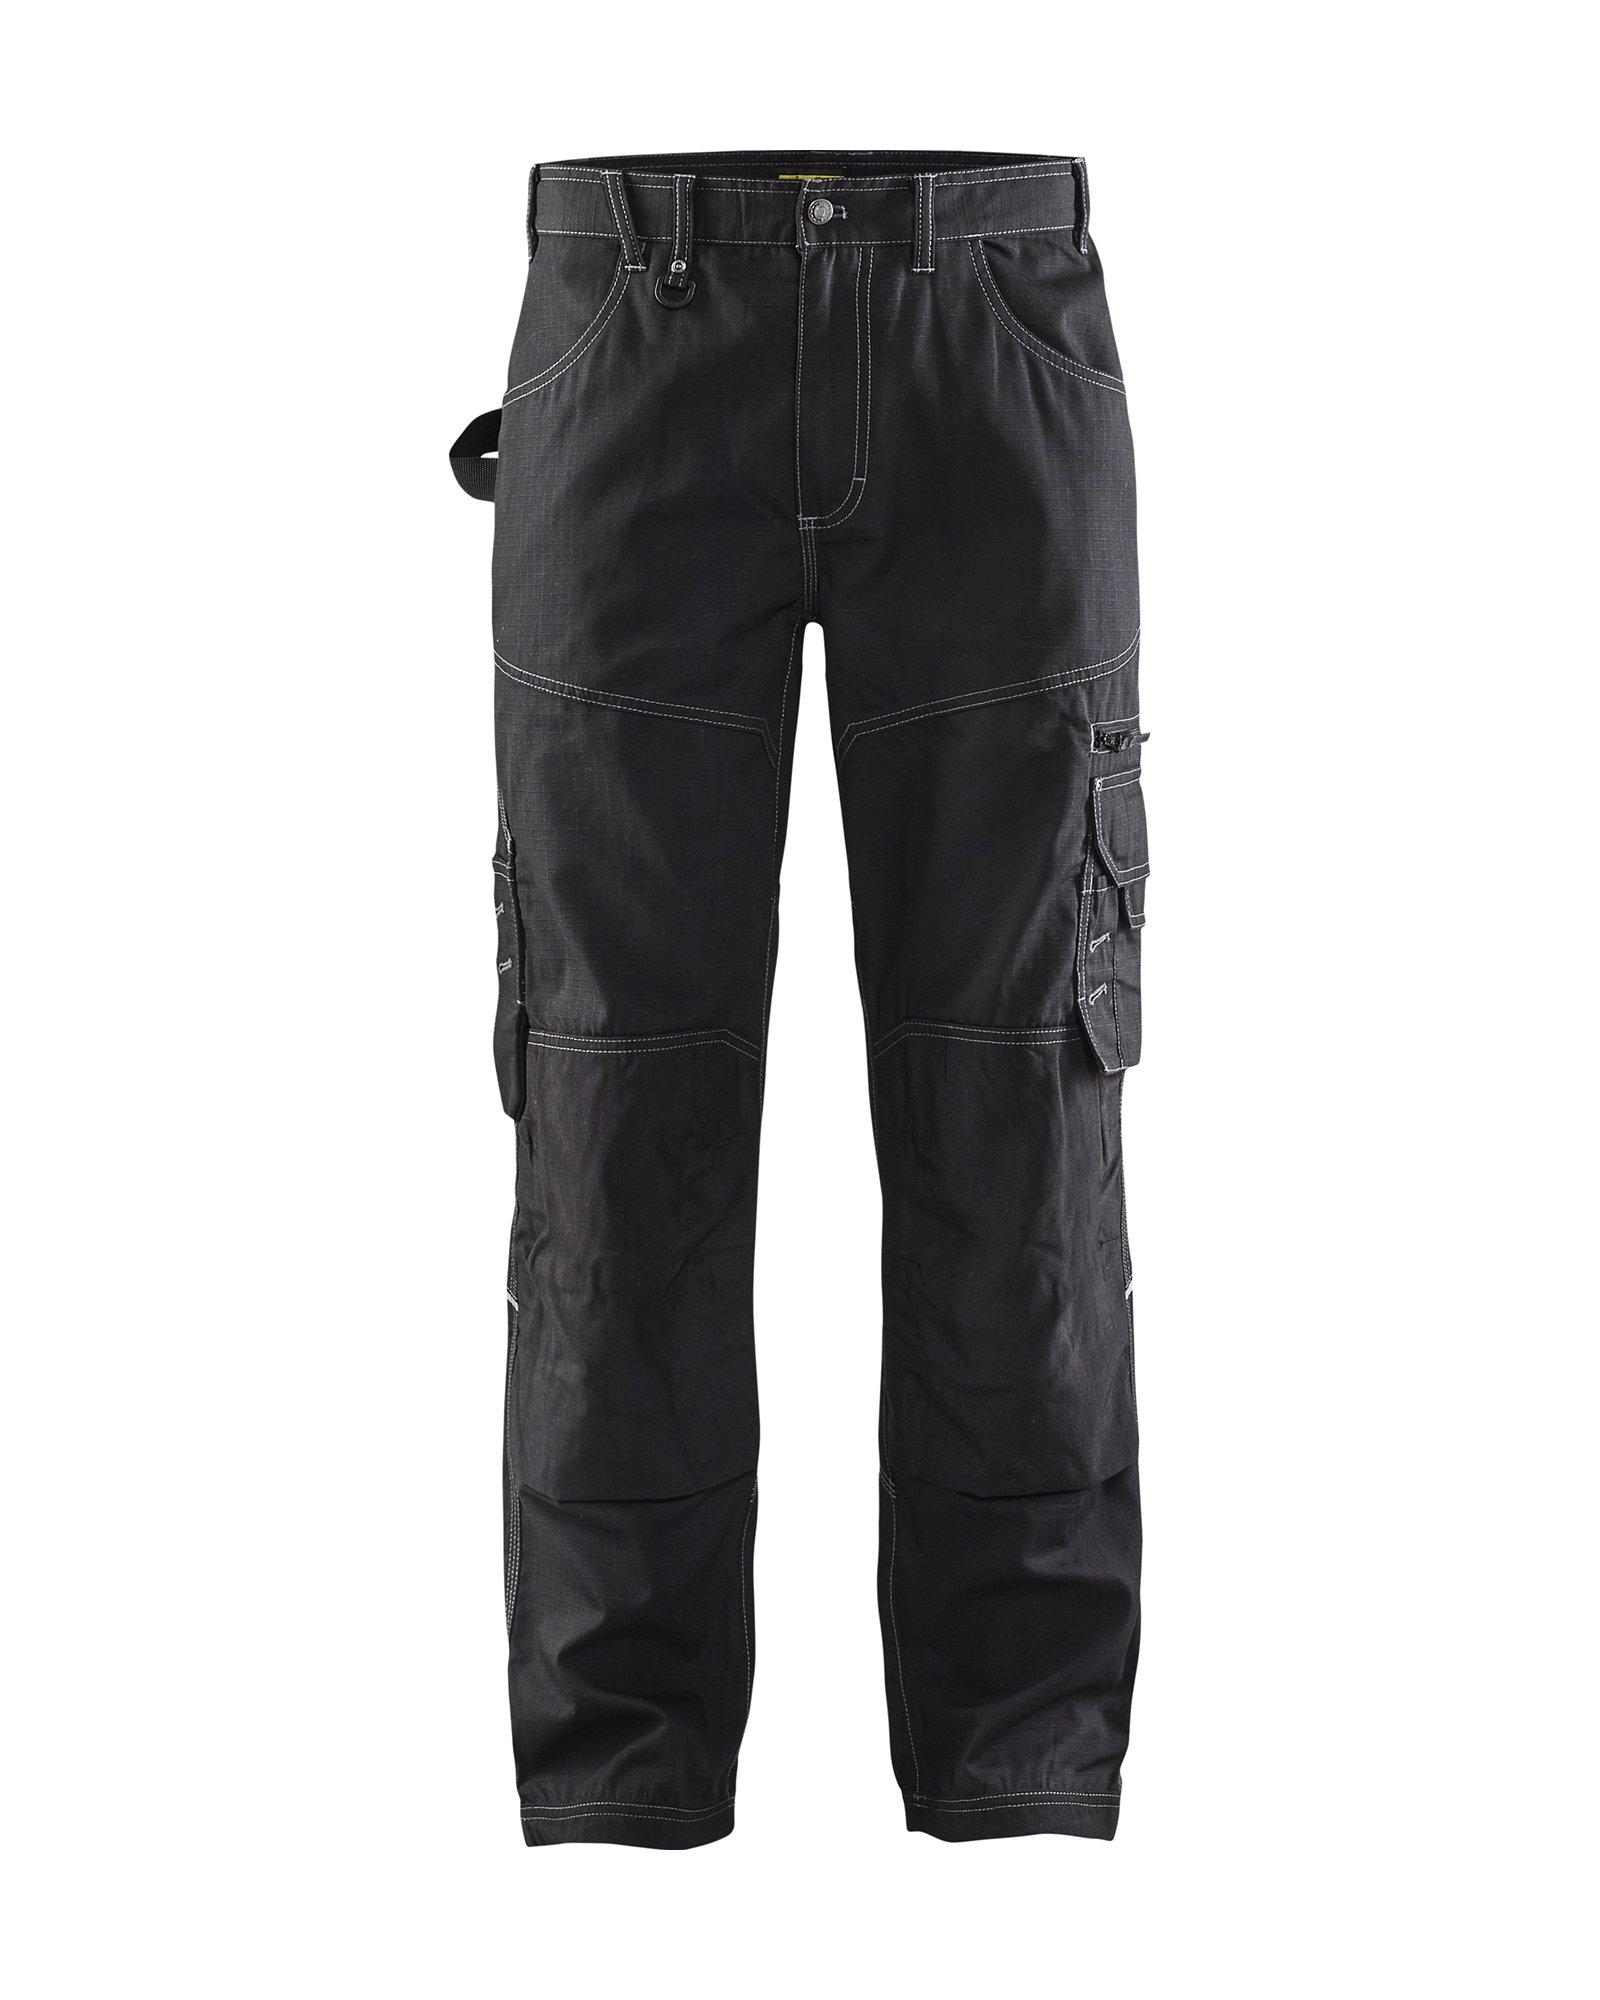 Blaklader Ripstop Pants Black 32 32